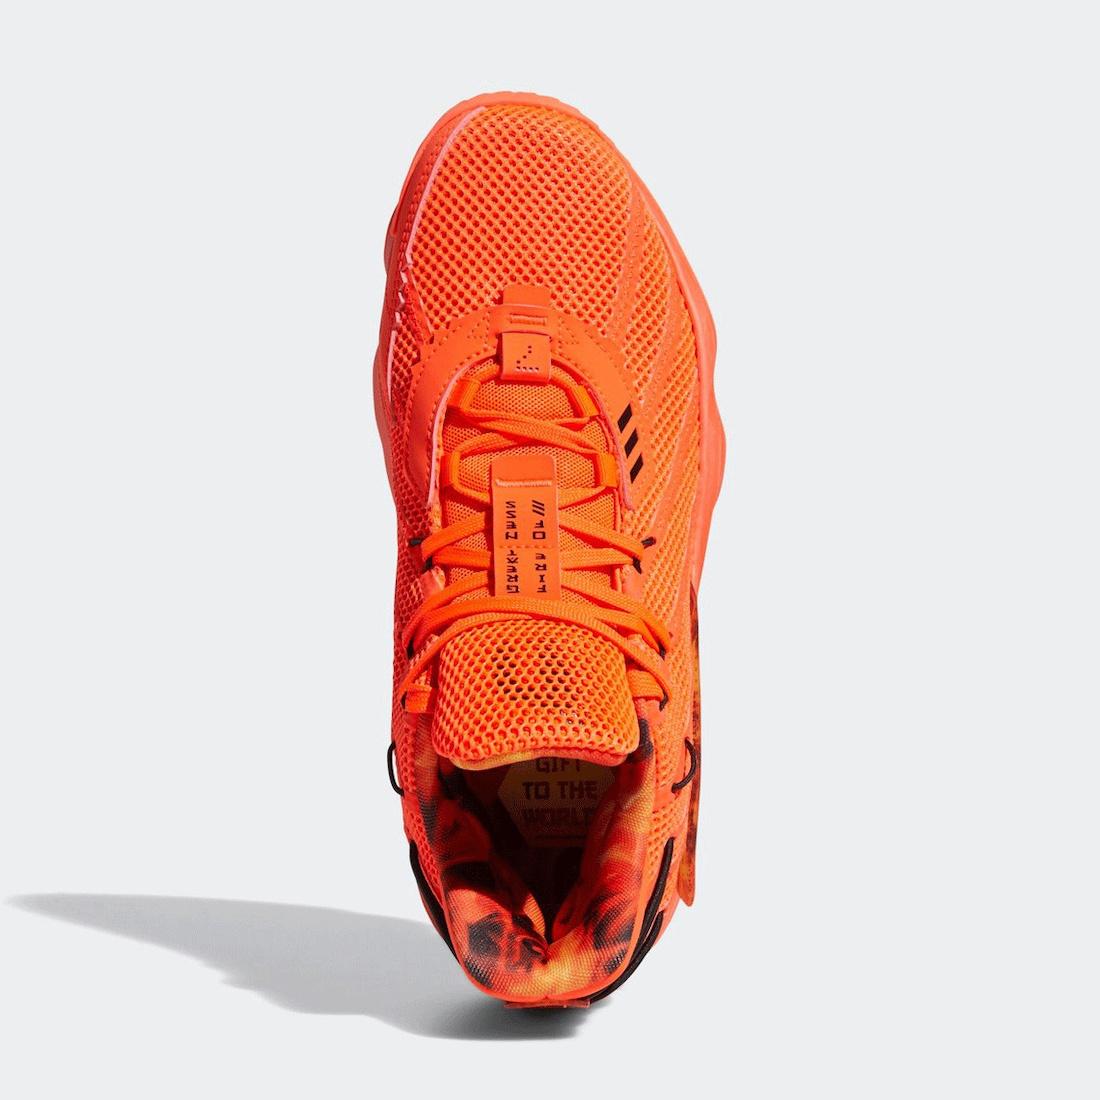 adidas Dame 7 Fire Inside FX7439 Release Date Info